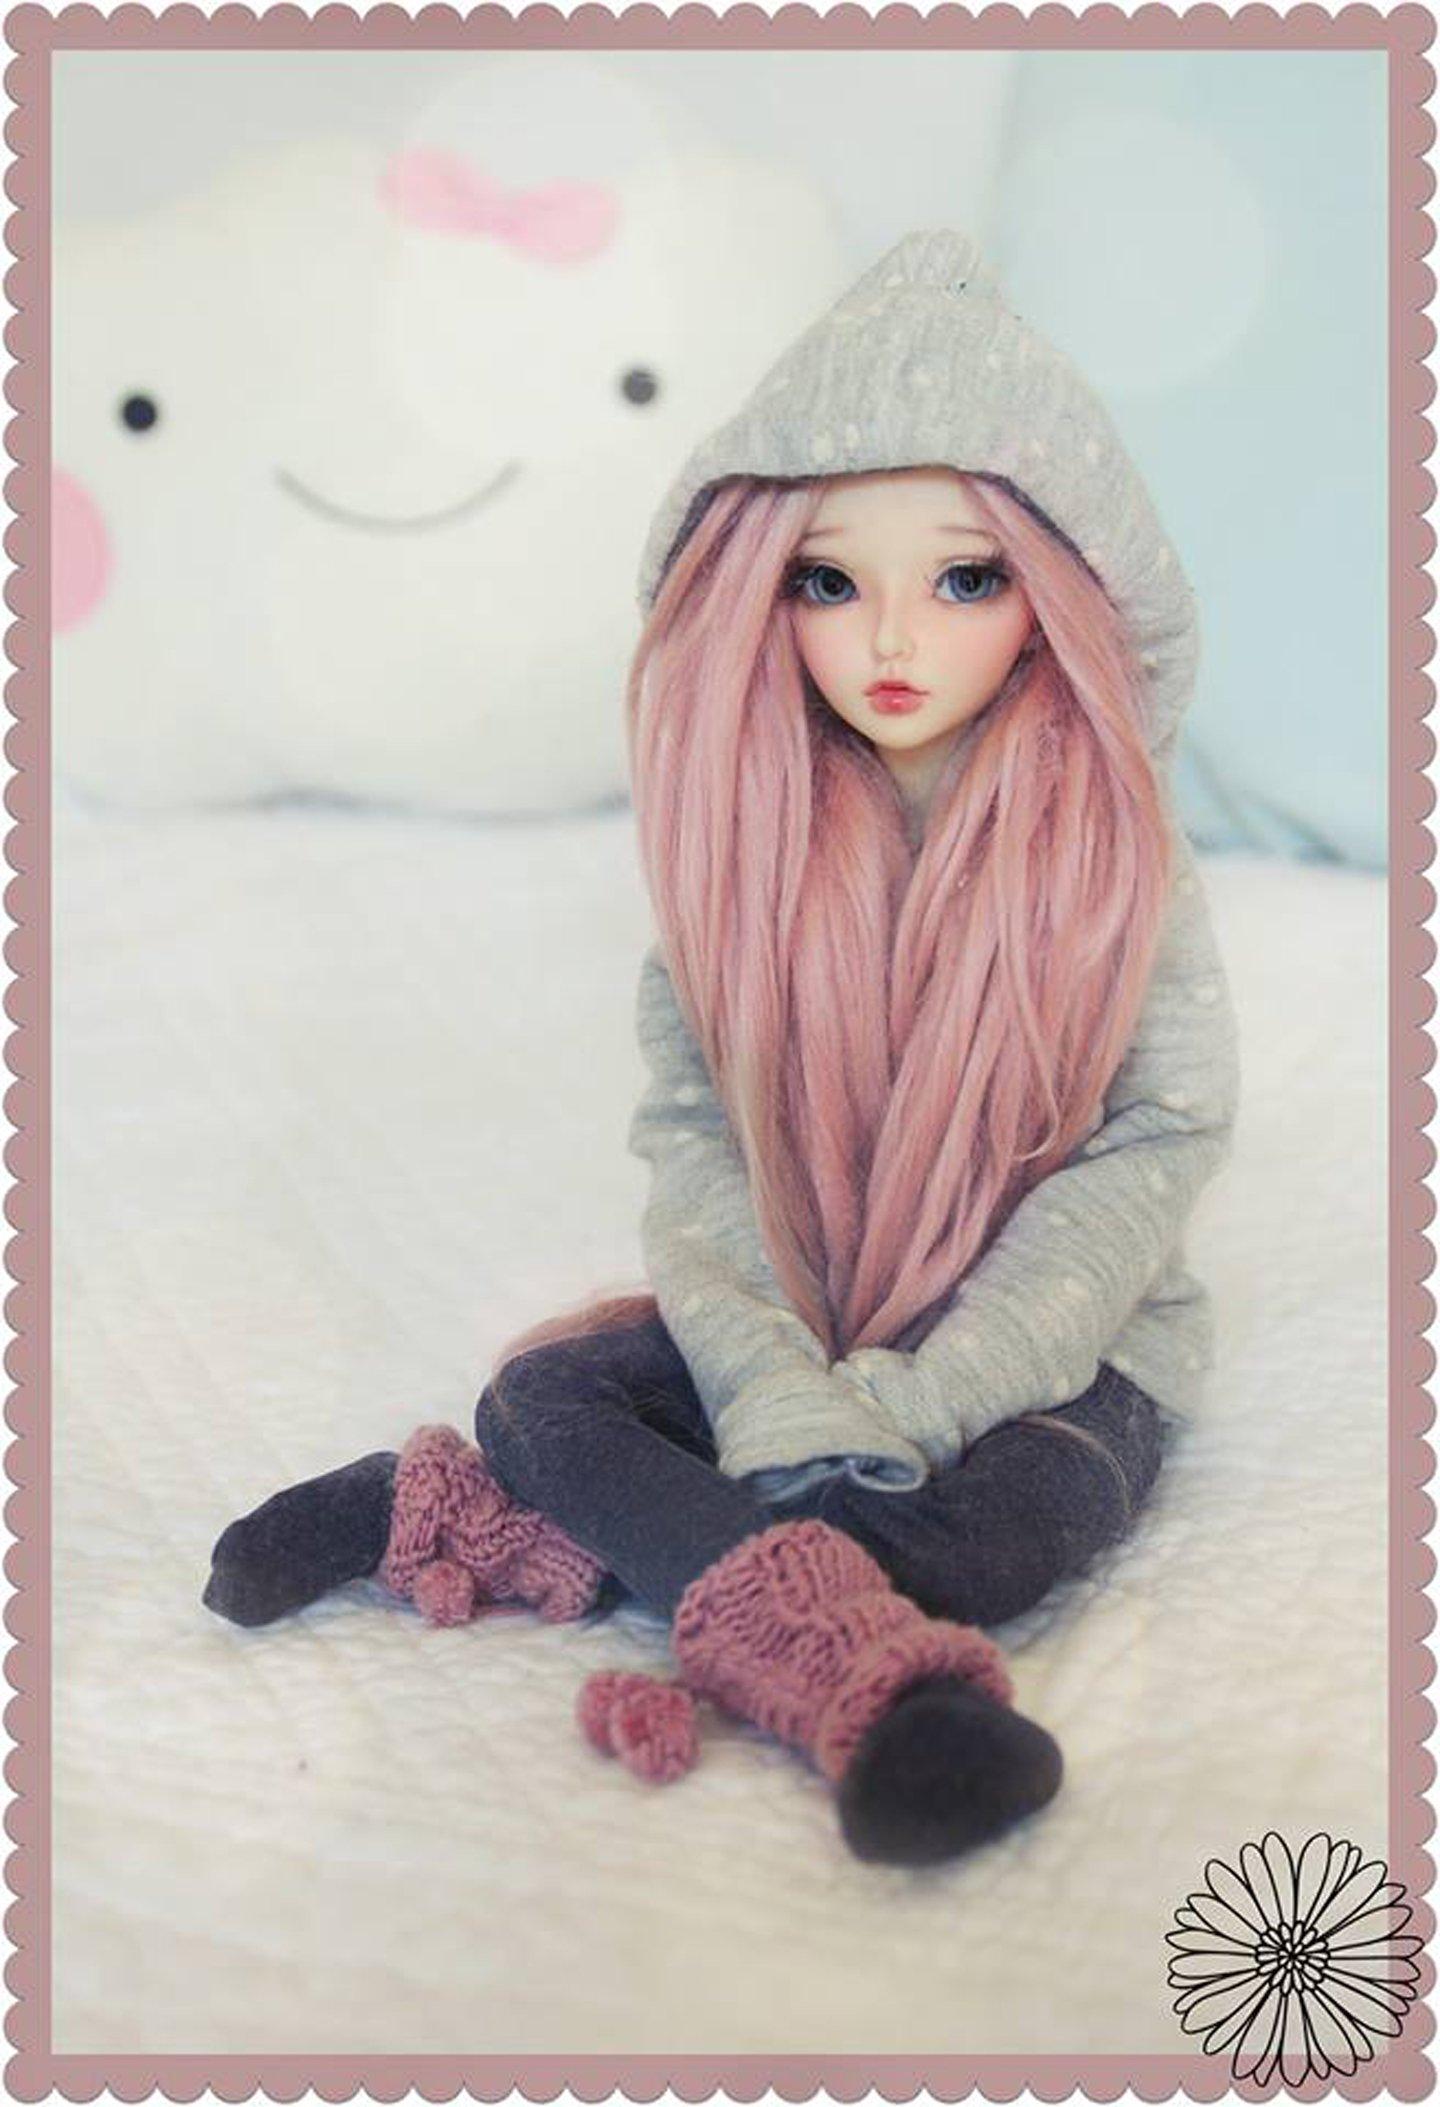 Doll Toys Long Hair Girl Beauty Dress Cute Blue Eyes Pink Wallpaper